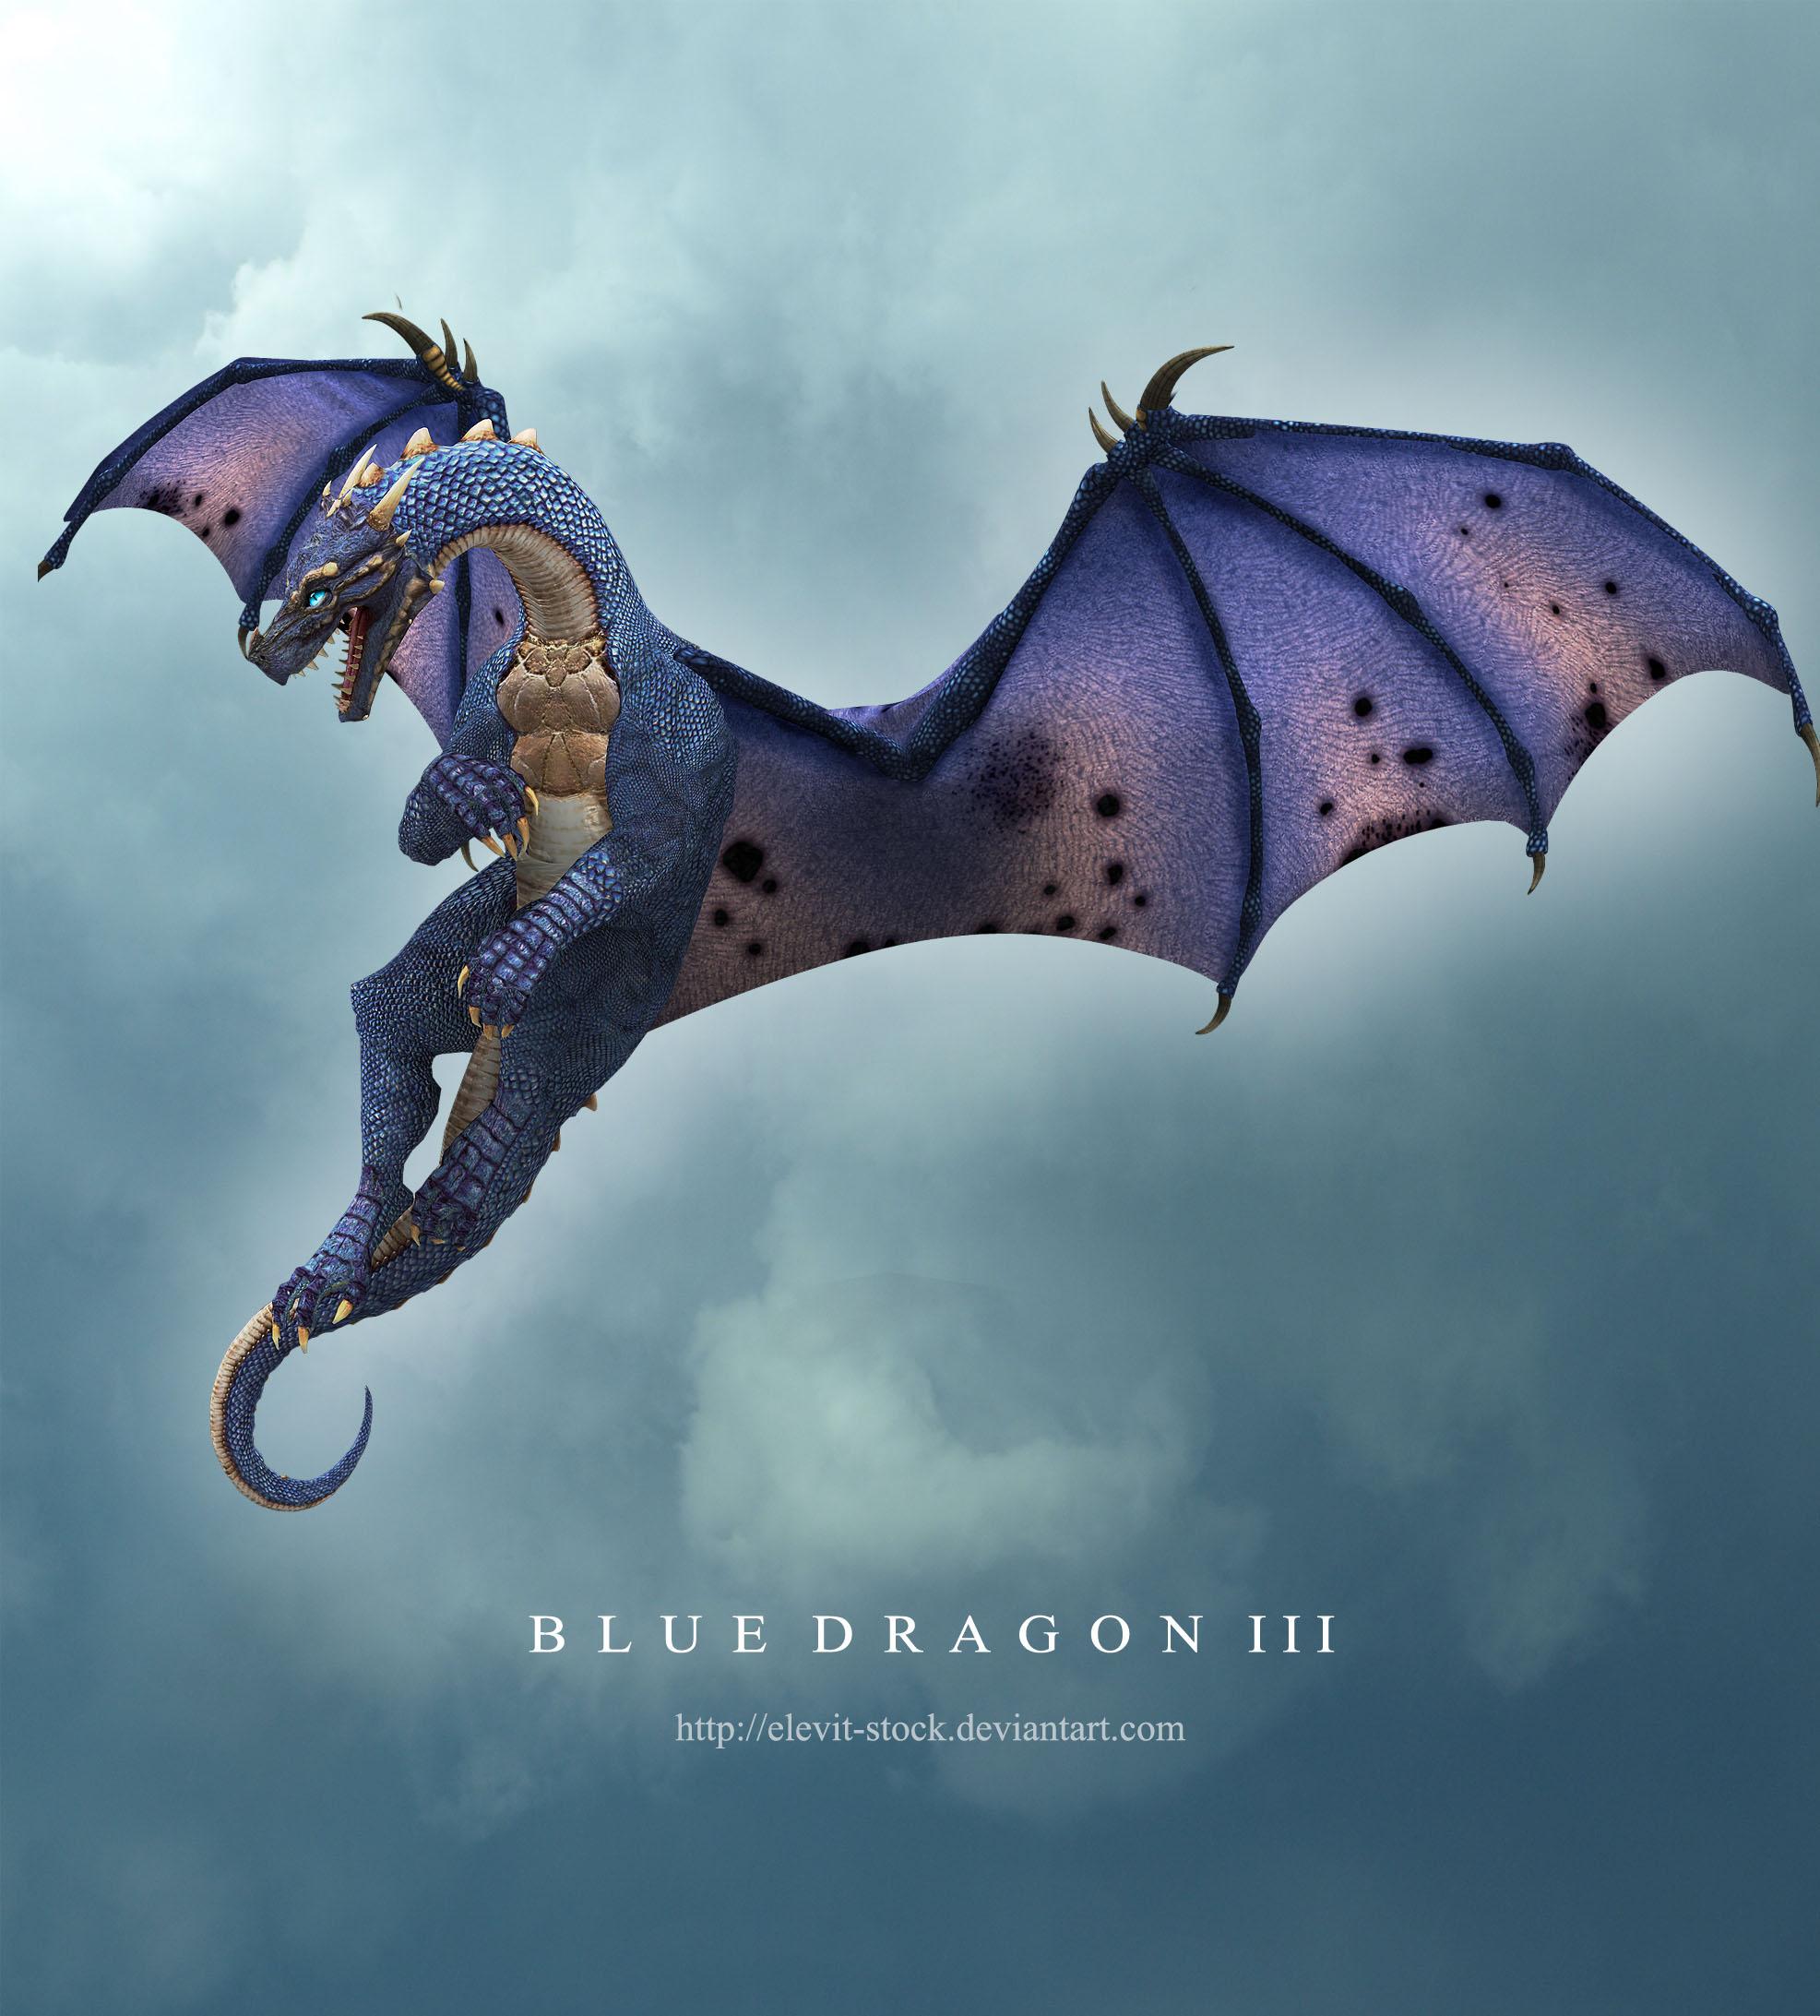 Blue Dragon III